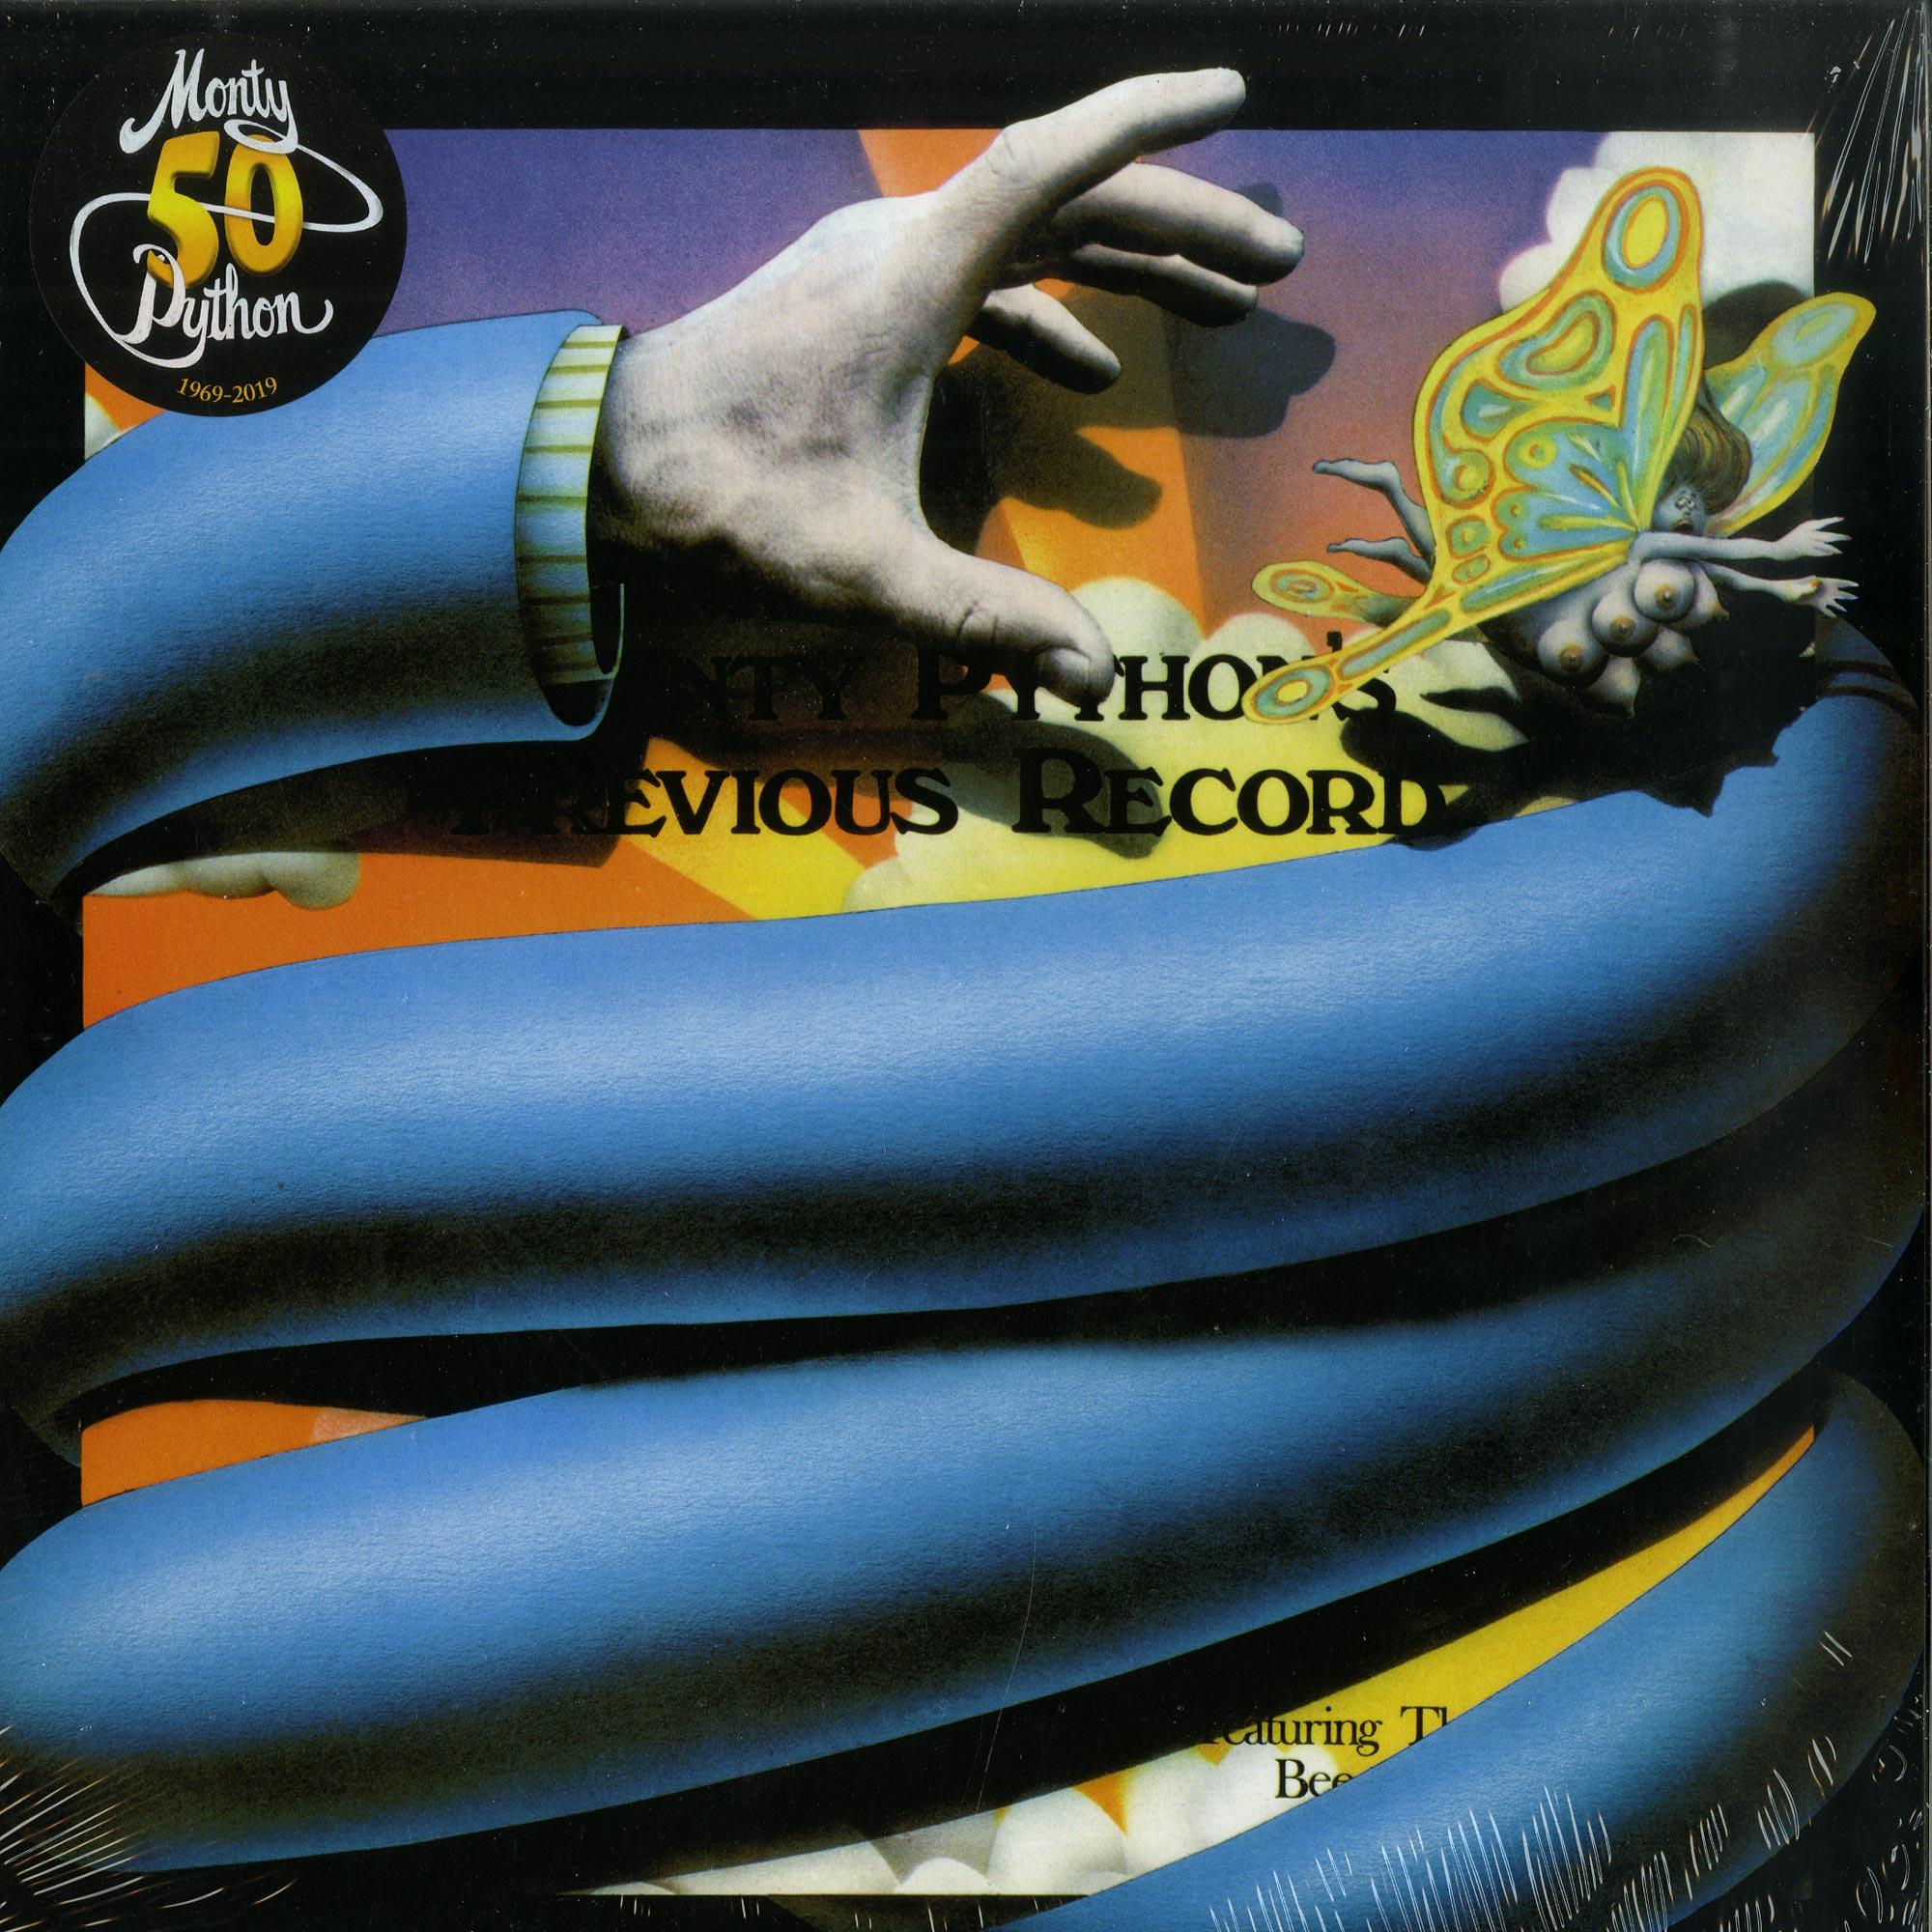 Monty Python - MONTY PYTHONS PREVIOUS RECORD